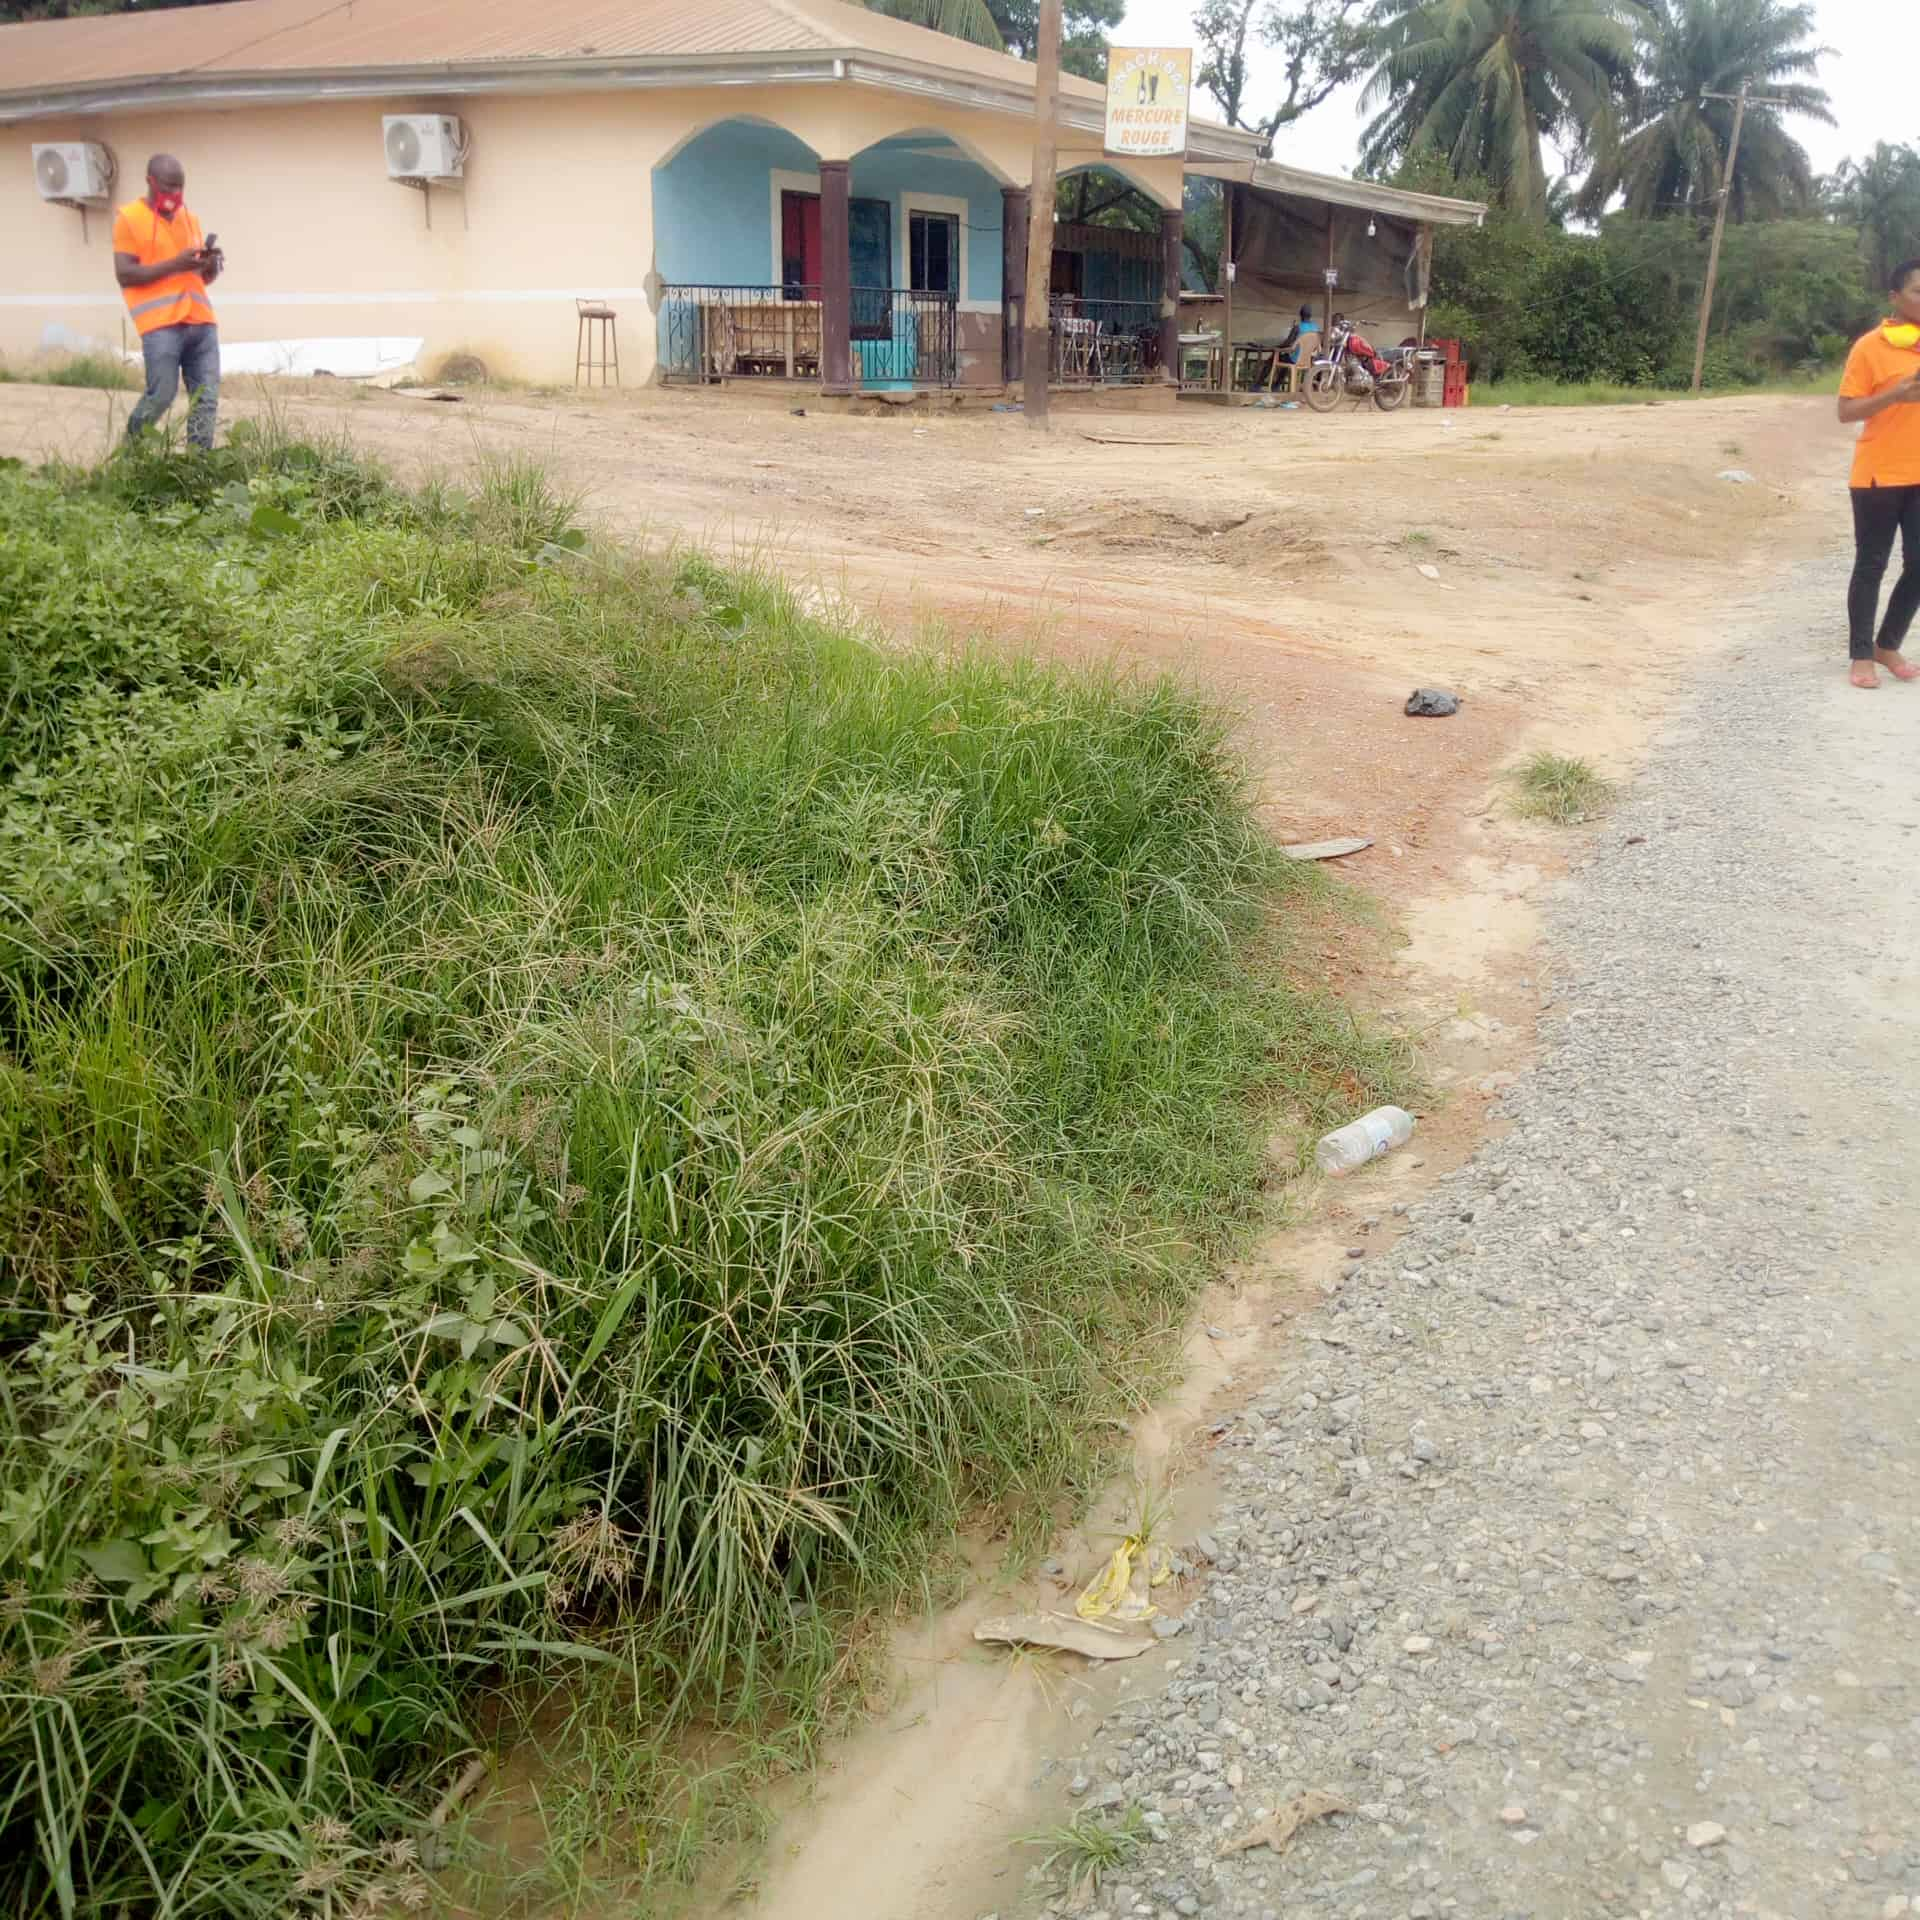 Land for sale at Douala, Kotto, Kotto pilote et kotto village - 1000 m2 - 50 000 000 FCFA